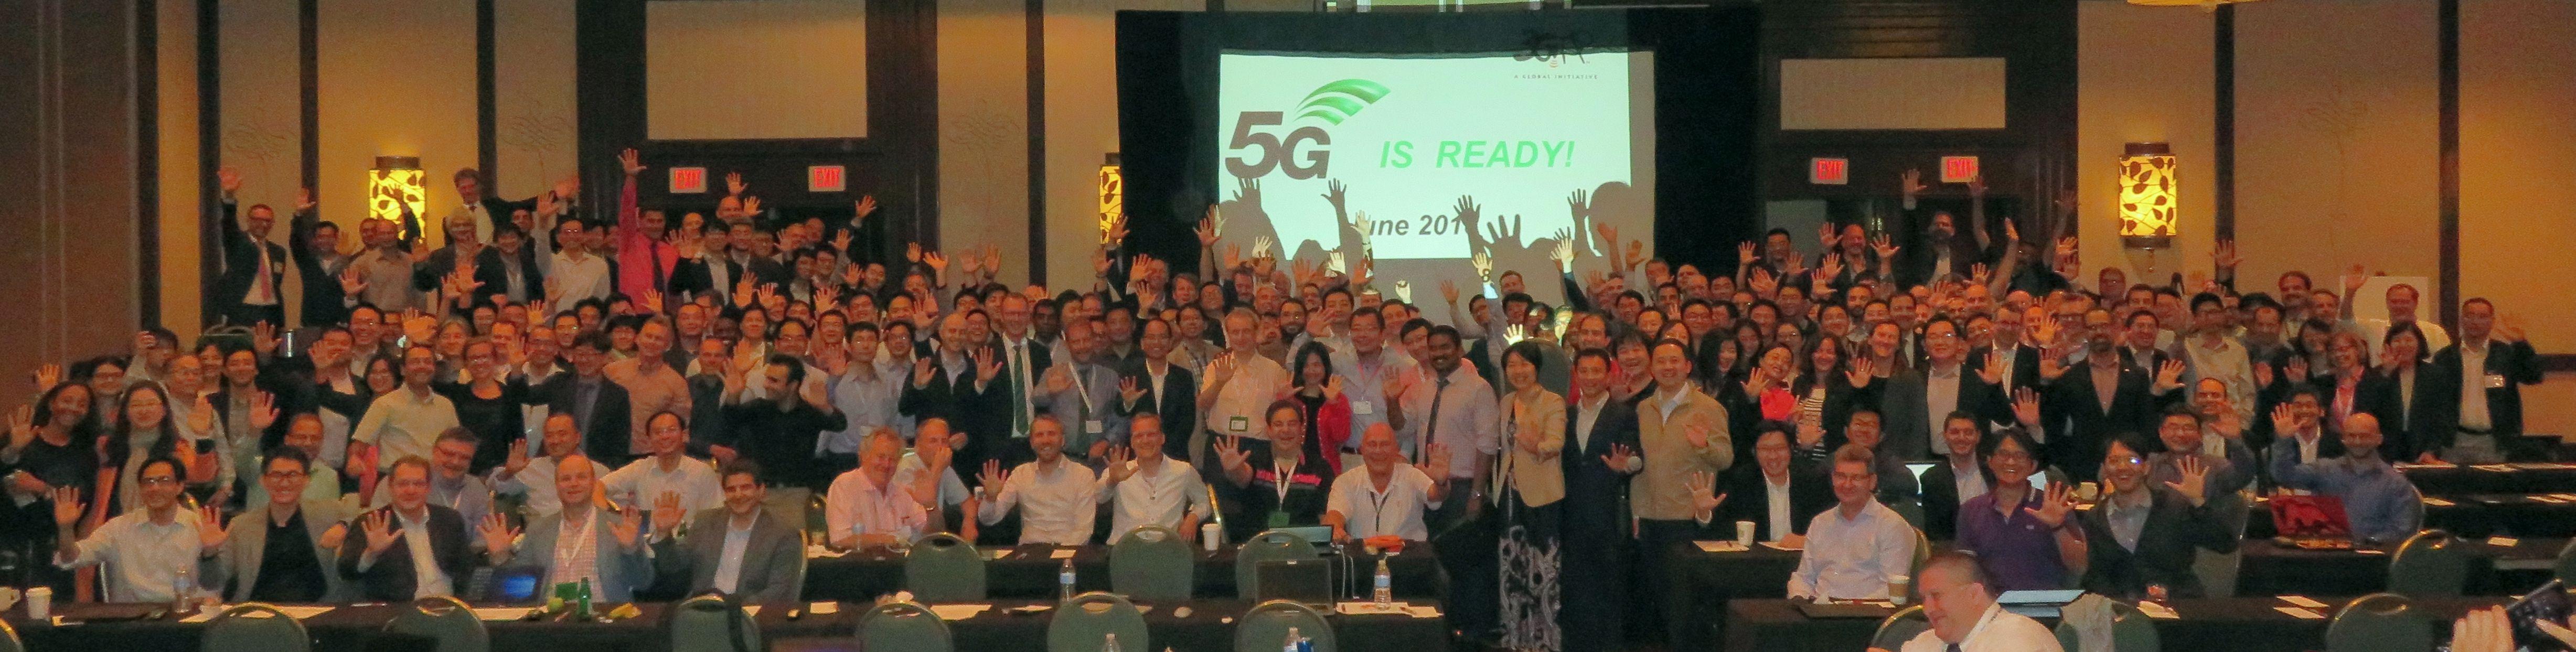 Group photo from last week's 5G meeting in La Jolla, Calif.